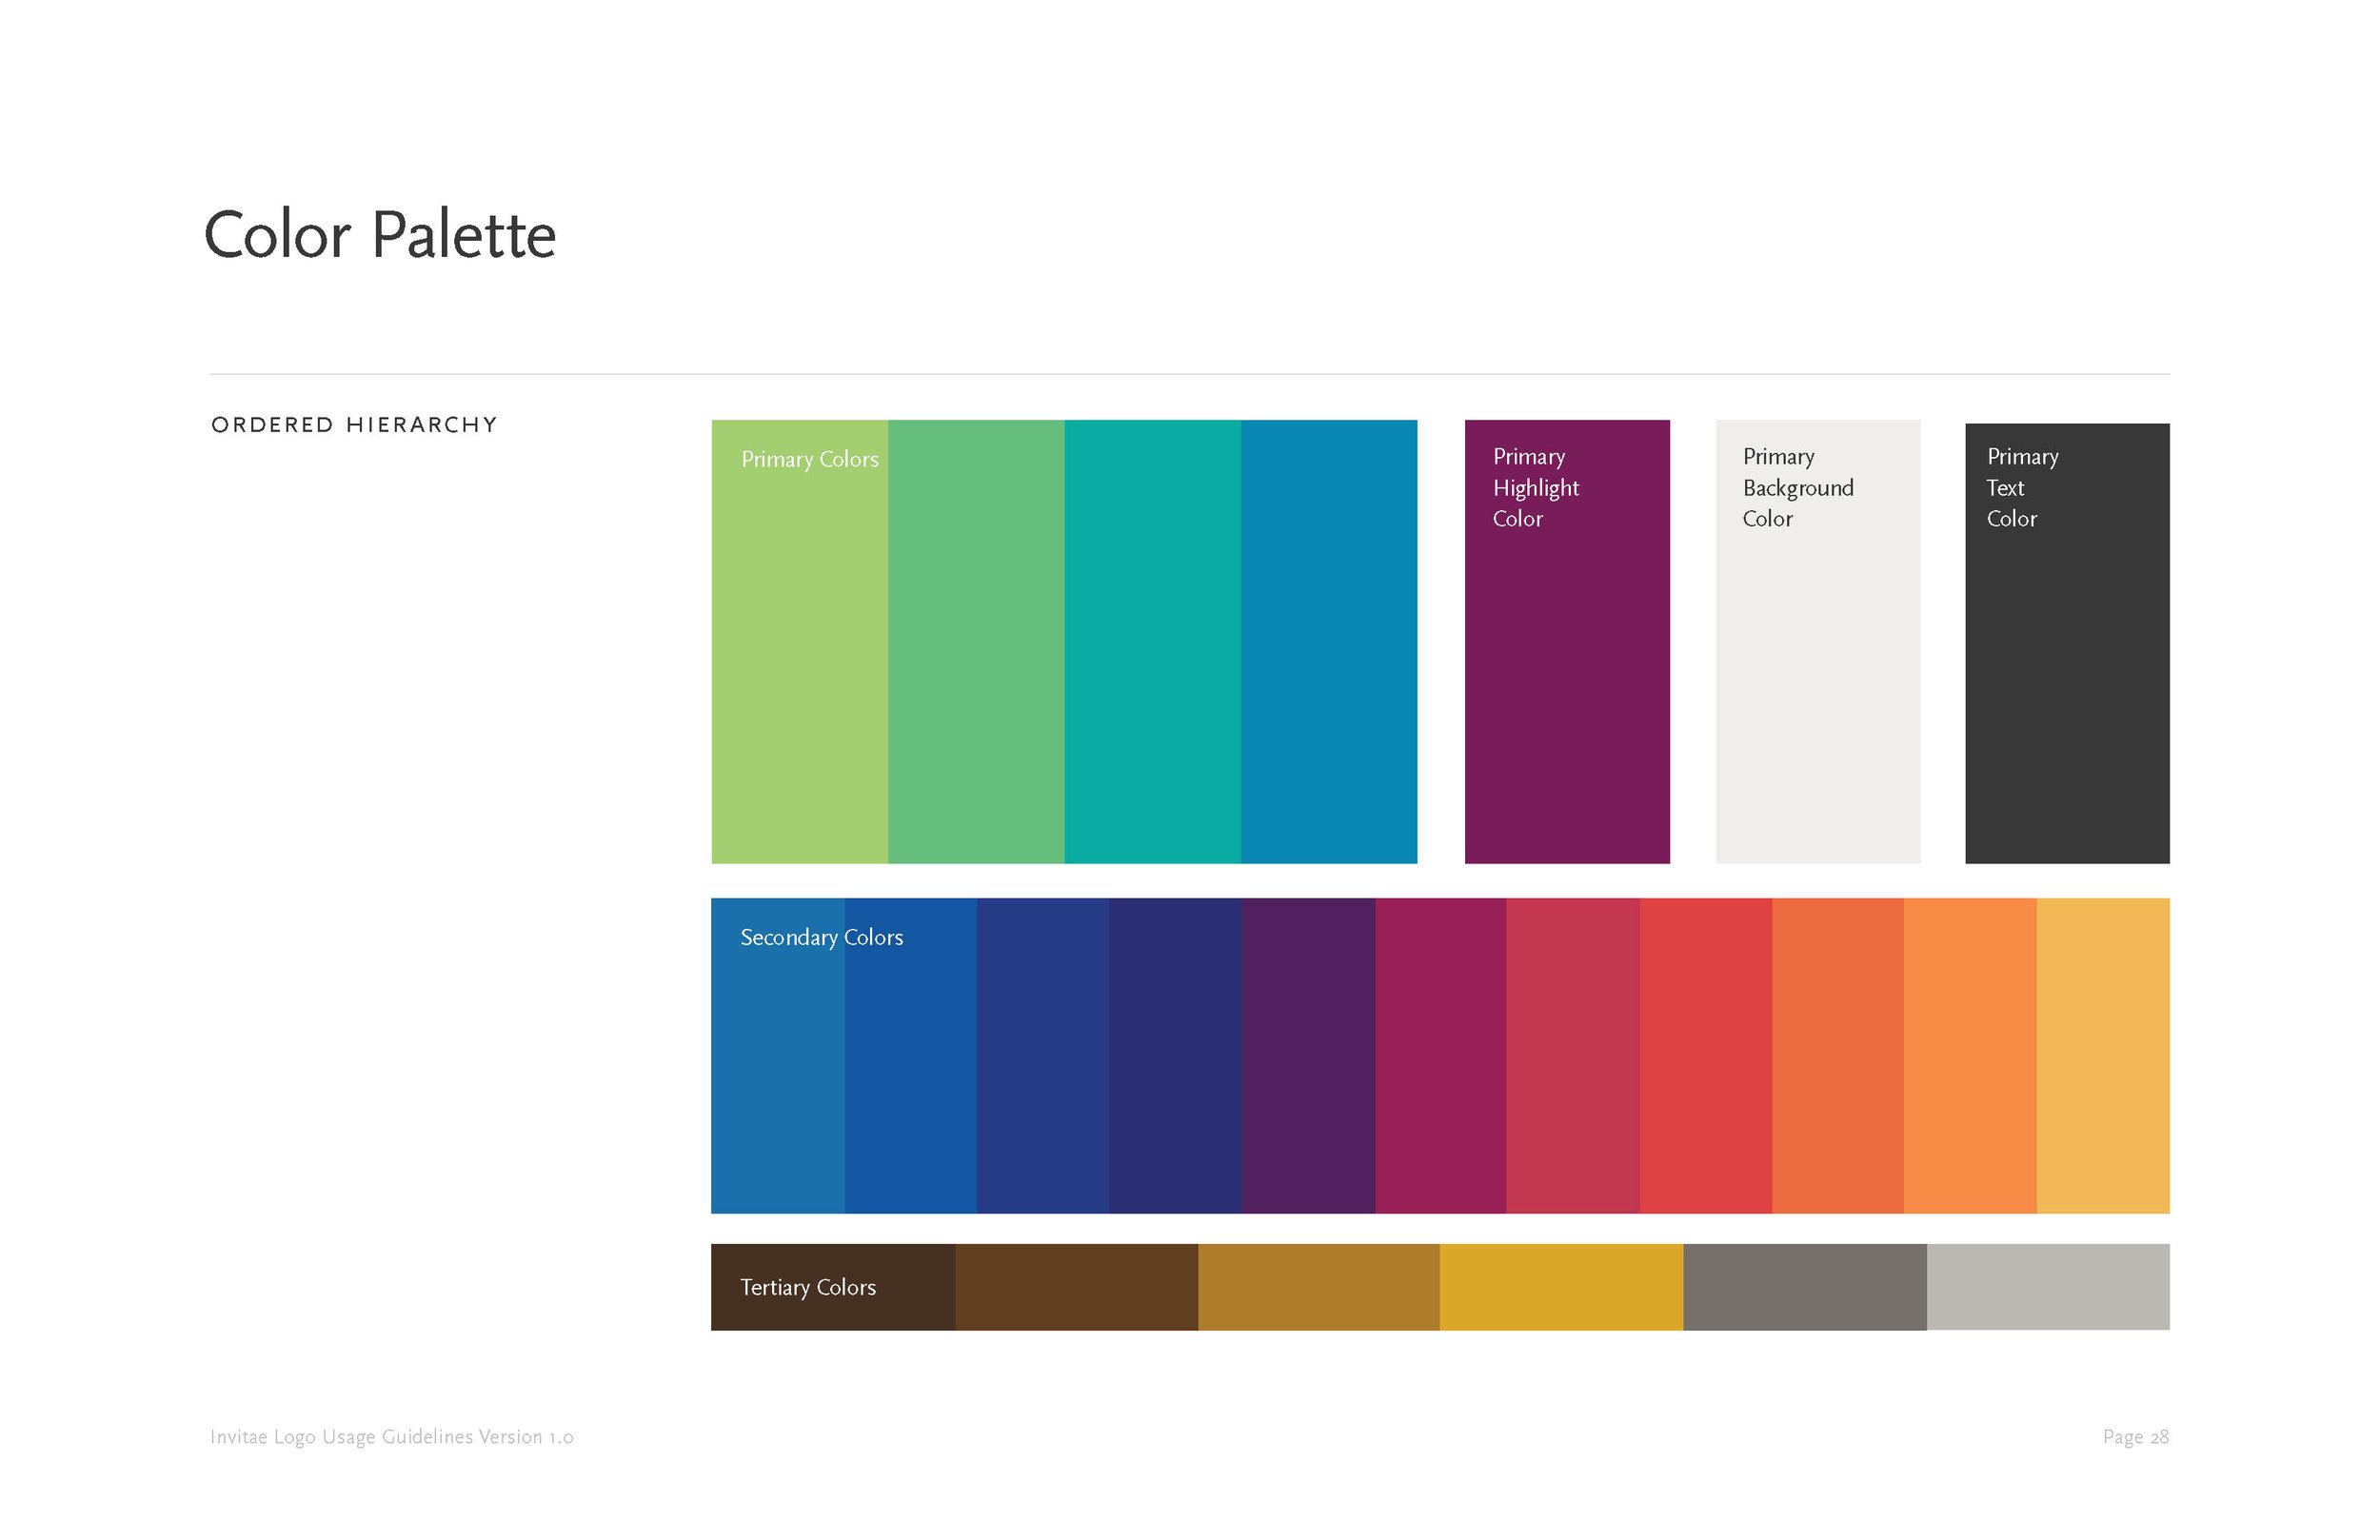 Invitae_logo_guidelines_Page_30.jpg